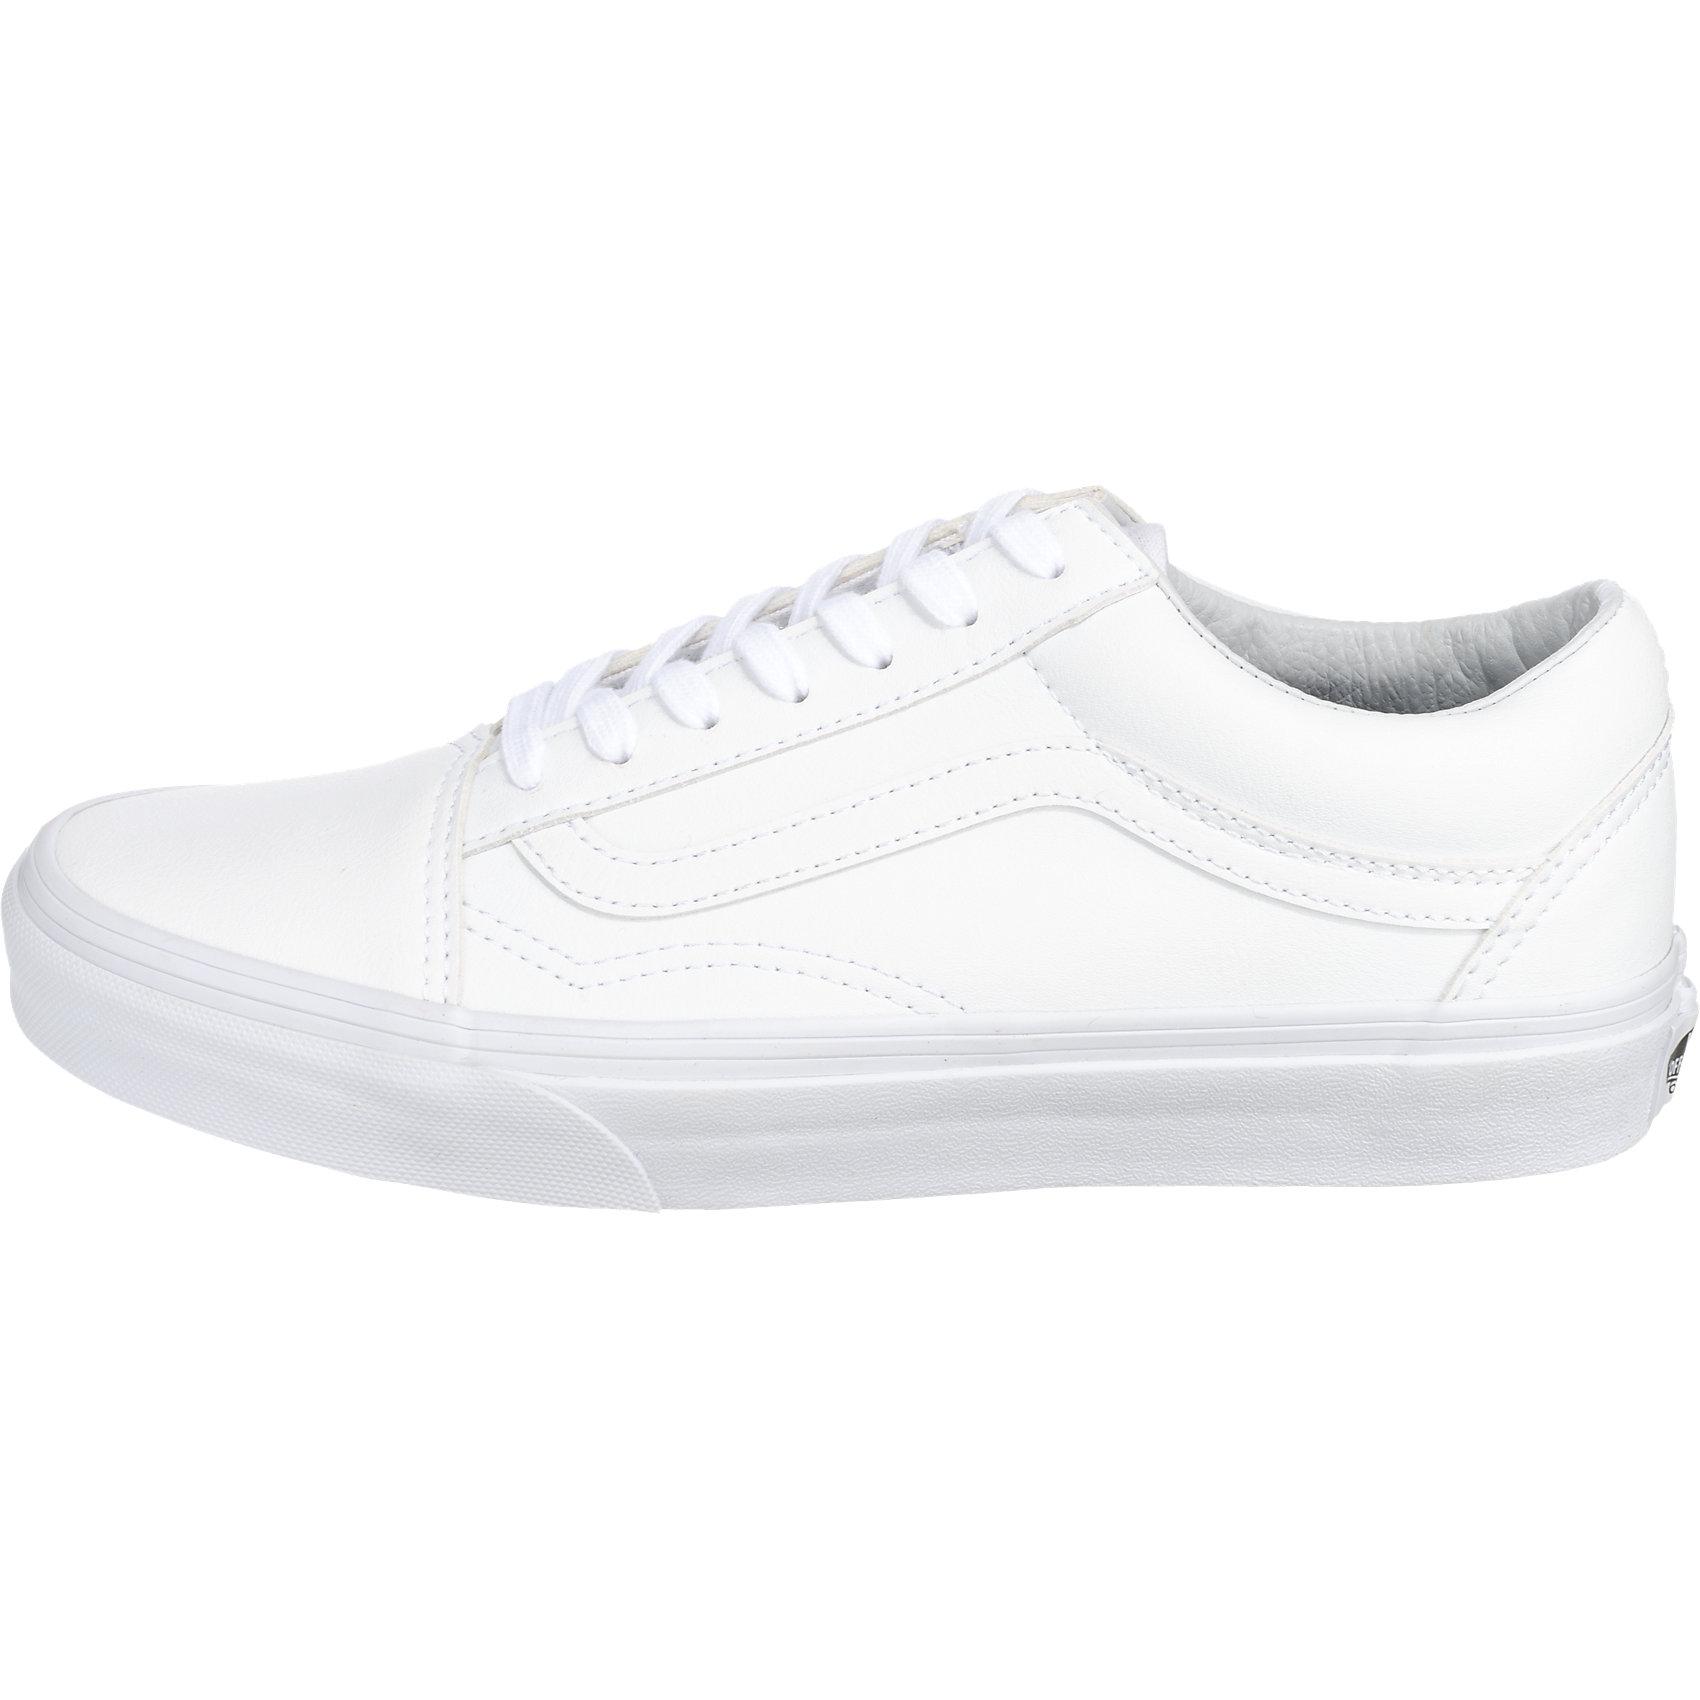 online store 8762c e0cdc ... Nike Free RN 831508 008 Mens Running Running Running Shoes Size 10.5  Black White  ...